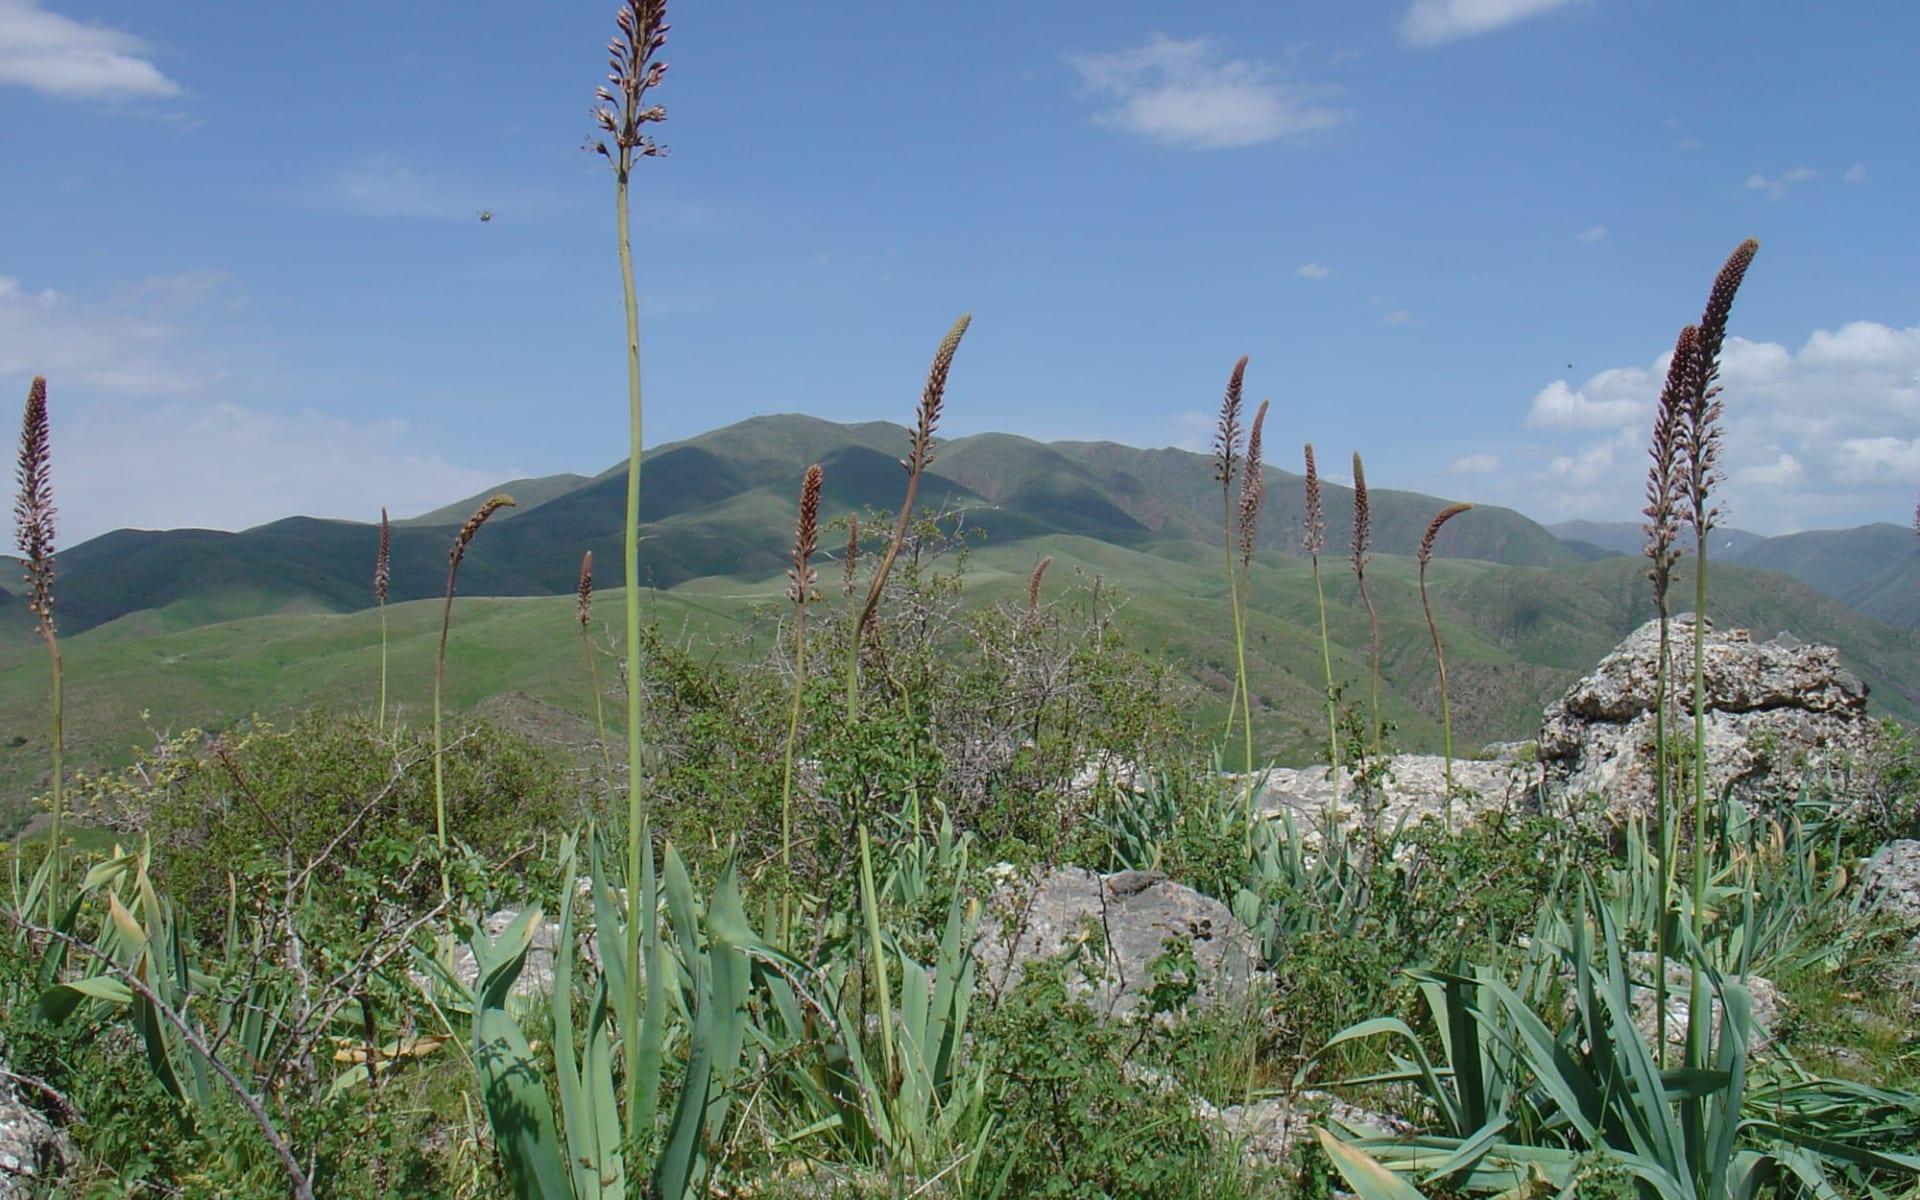 Kasachstan und Kirgistan kompakt ab Almaty: Kasachstan - Zabagly